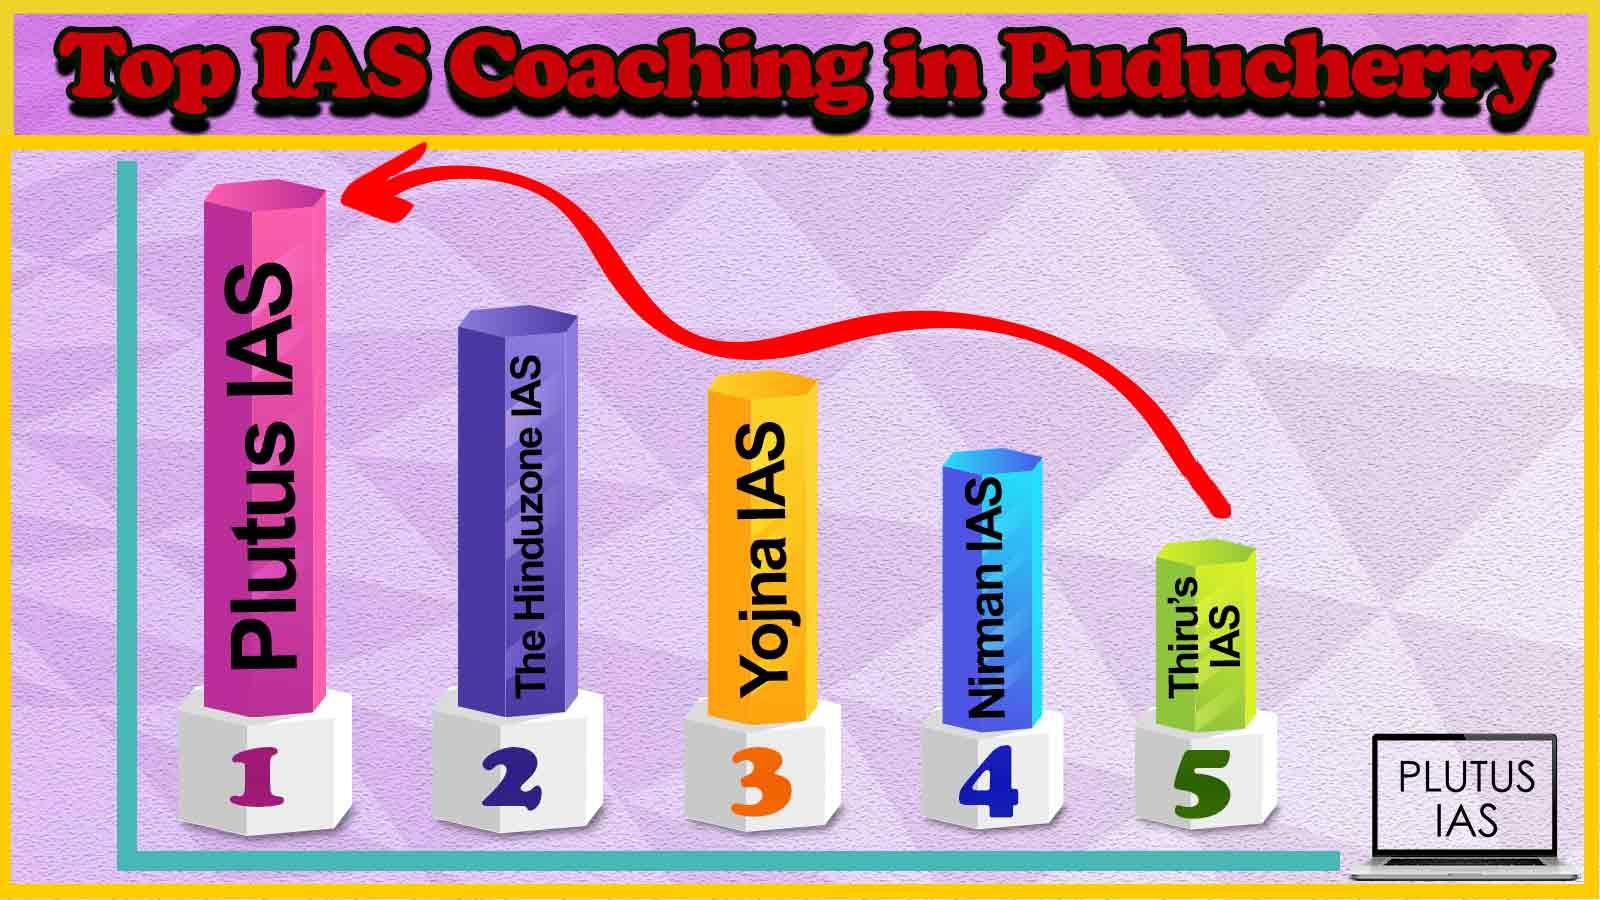 Best 10 IAS Coaching in Puducherry